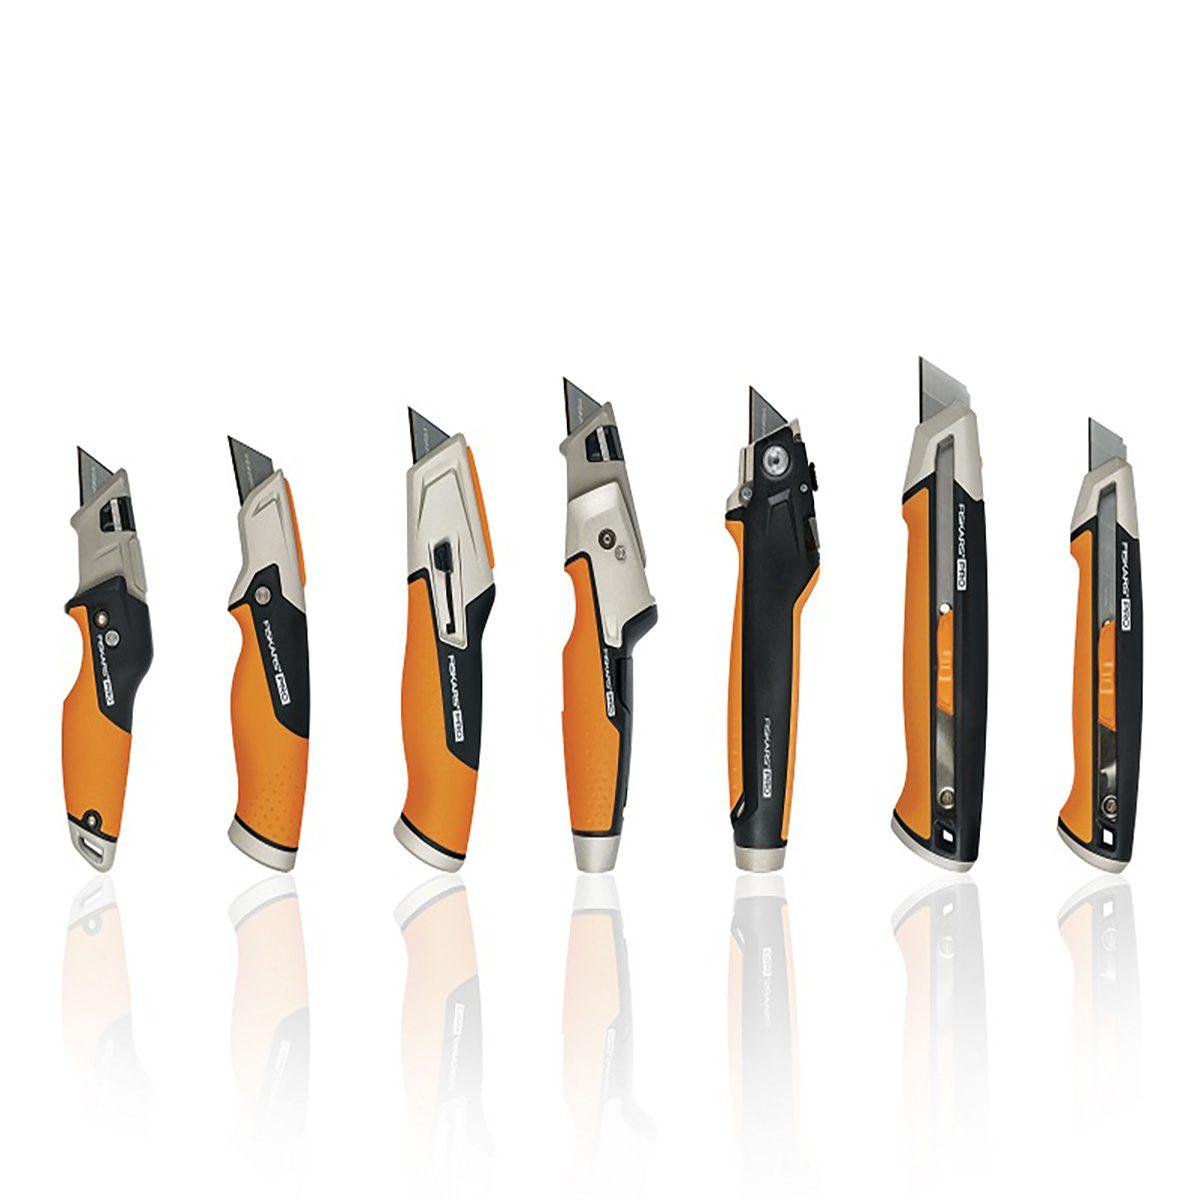 Line of Fiskars Utility Knives (Varying Sizes) | Construction Pro Tips